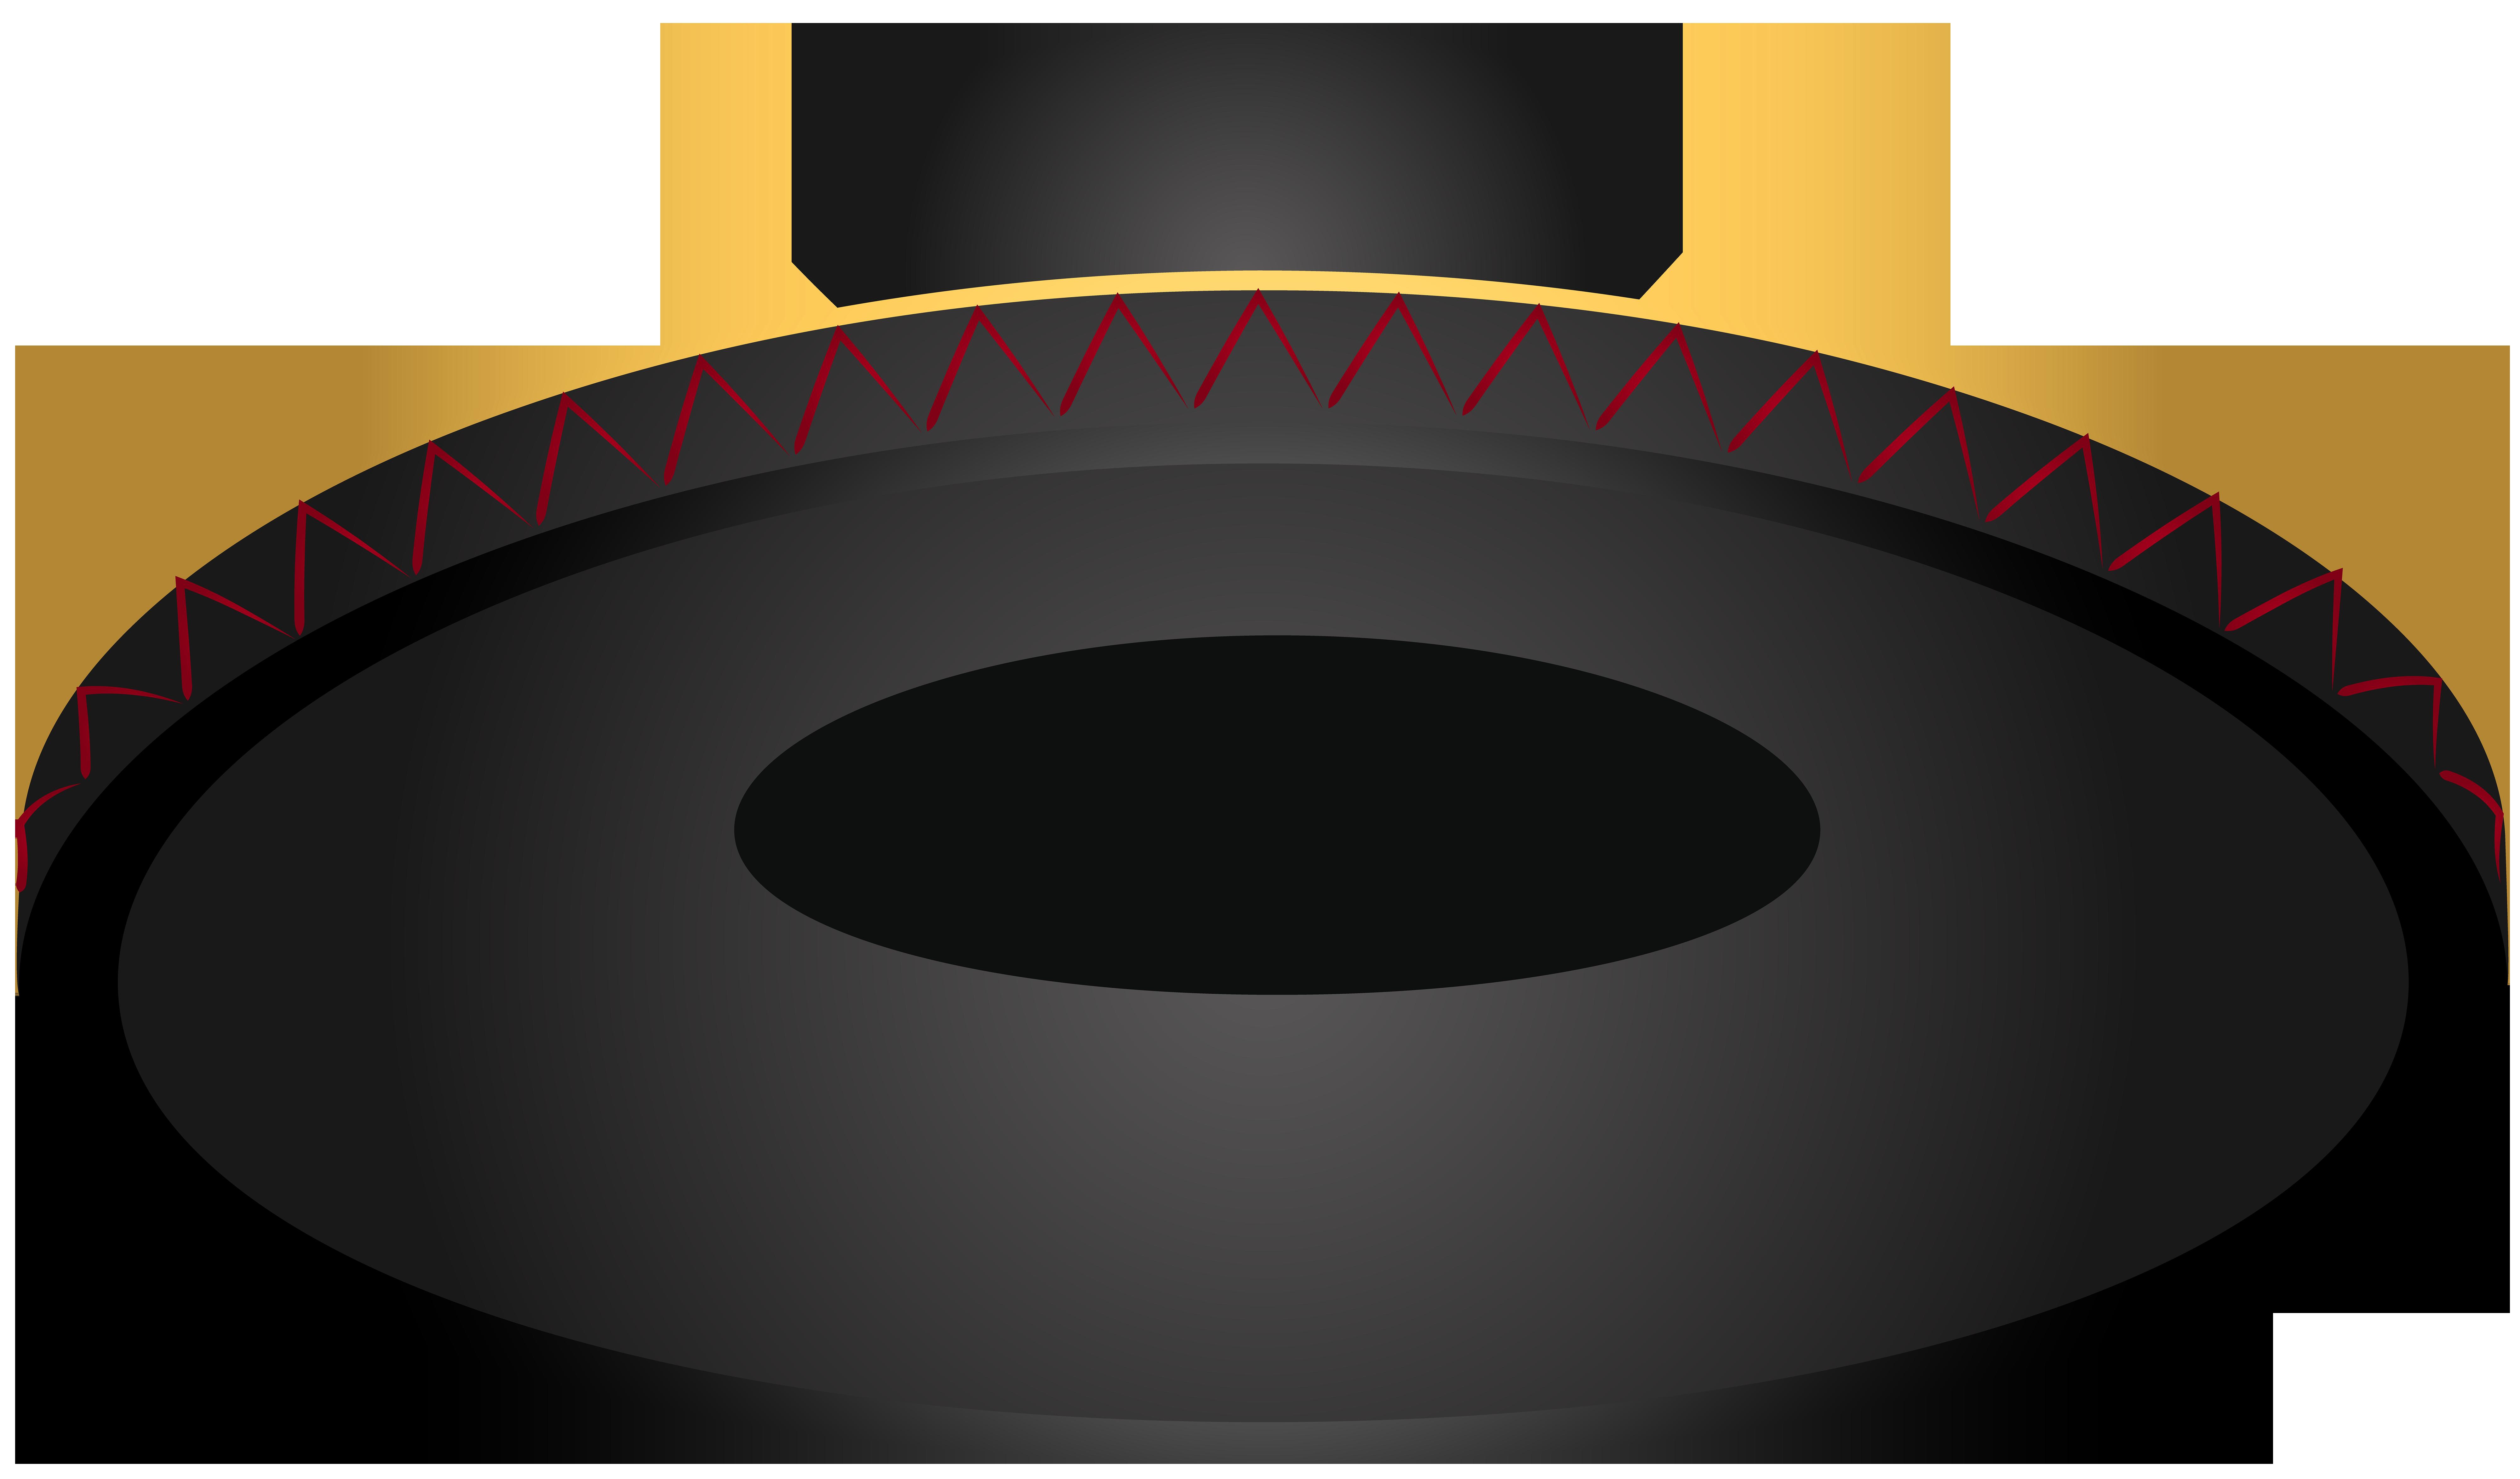 Black Spanish Hat PNG Clip Art Image.